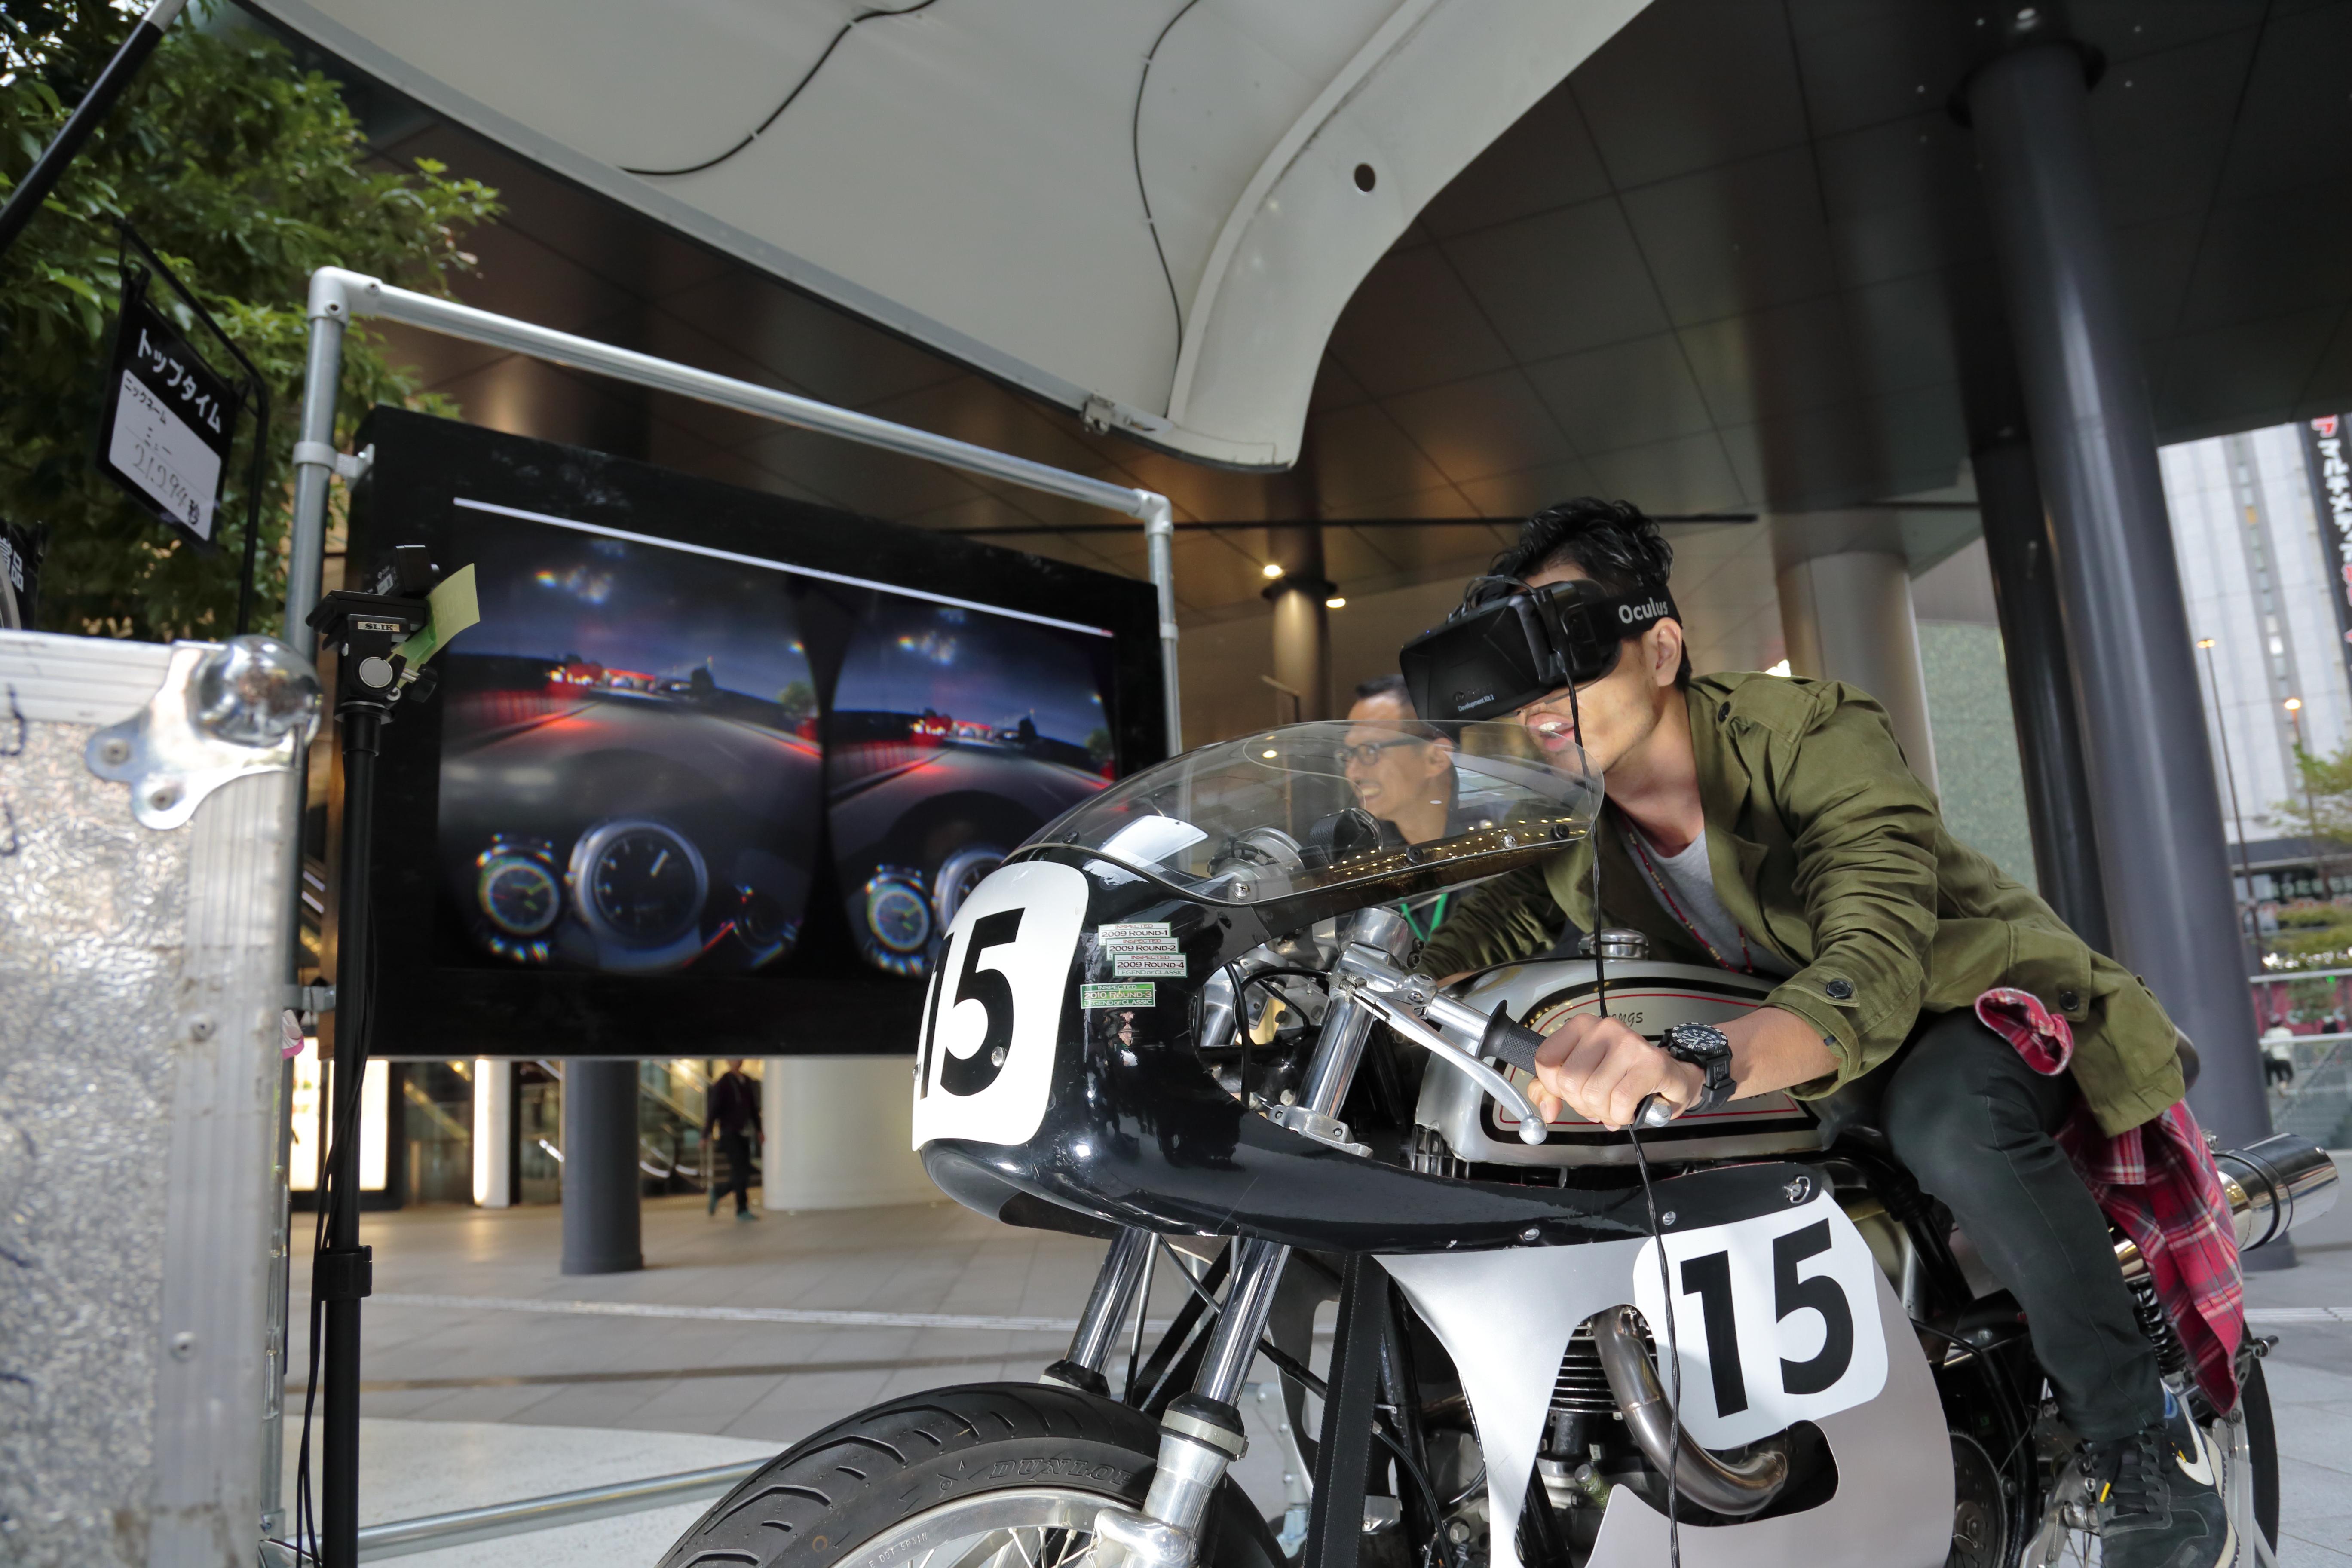 60'sロンドンを体感! DIESEL TIMEFRAMESのバーチャルバイクレースイベントが見逃せない